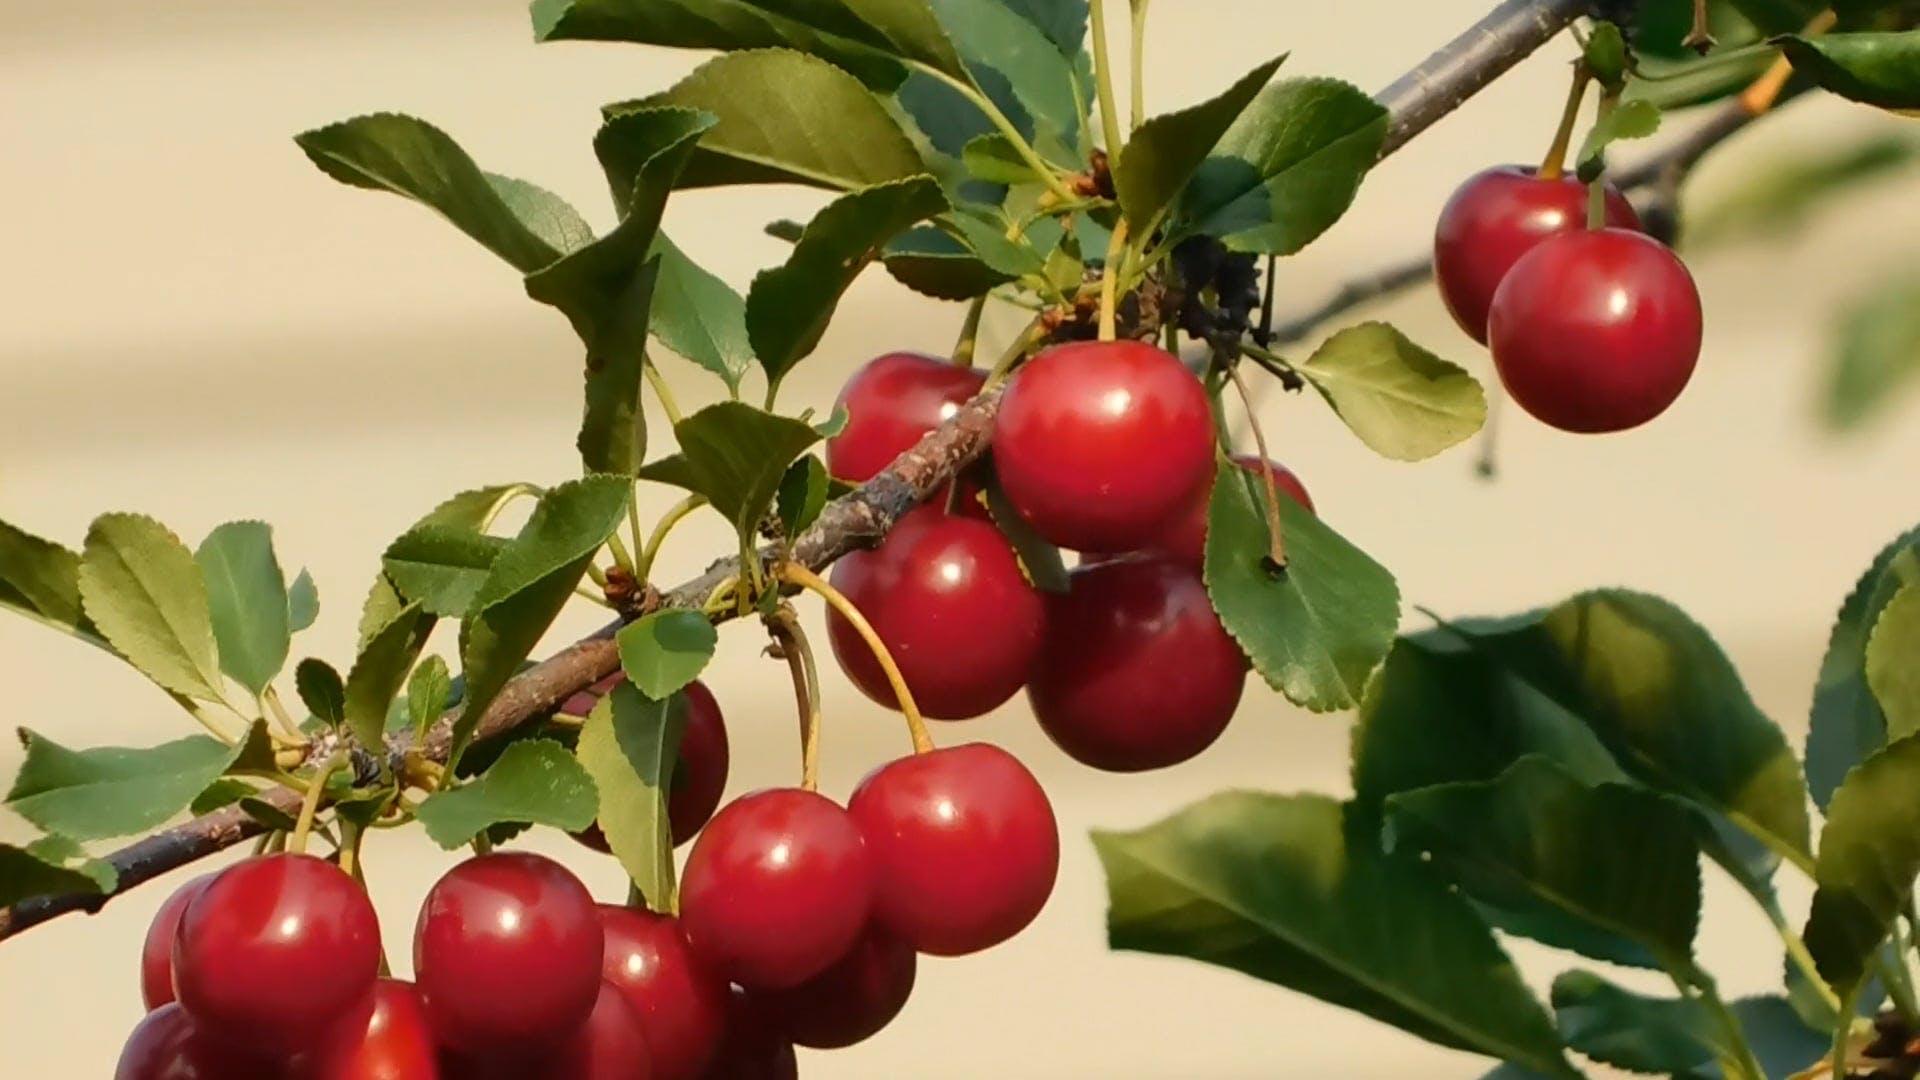 Cherries At Close View